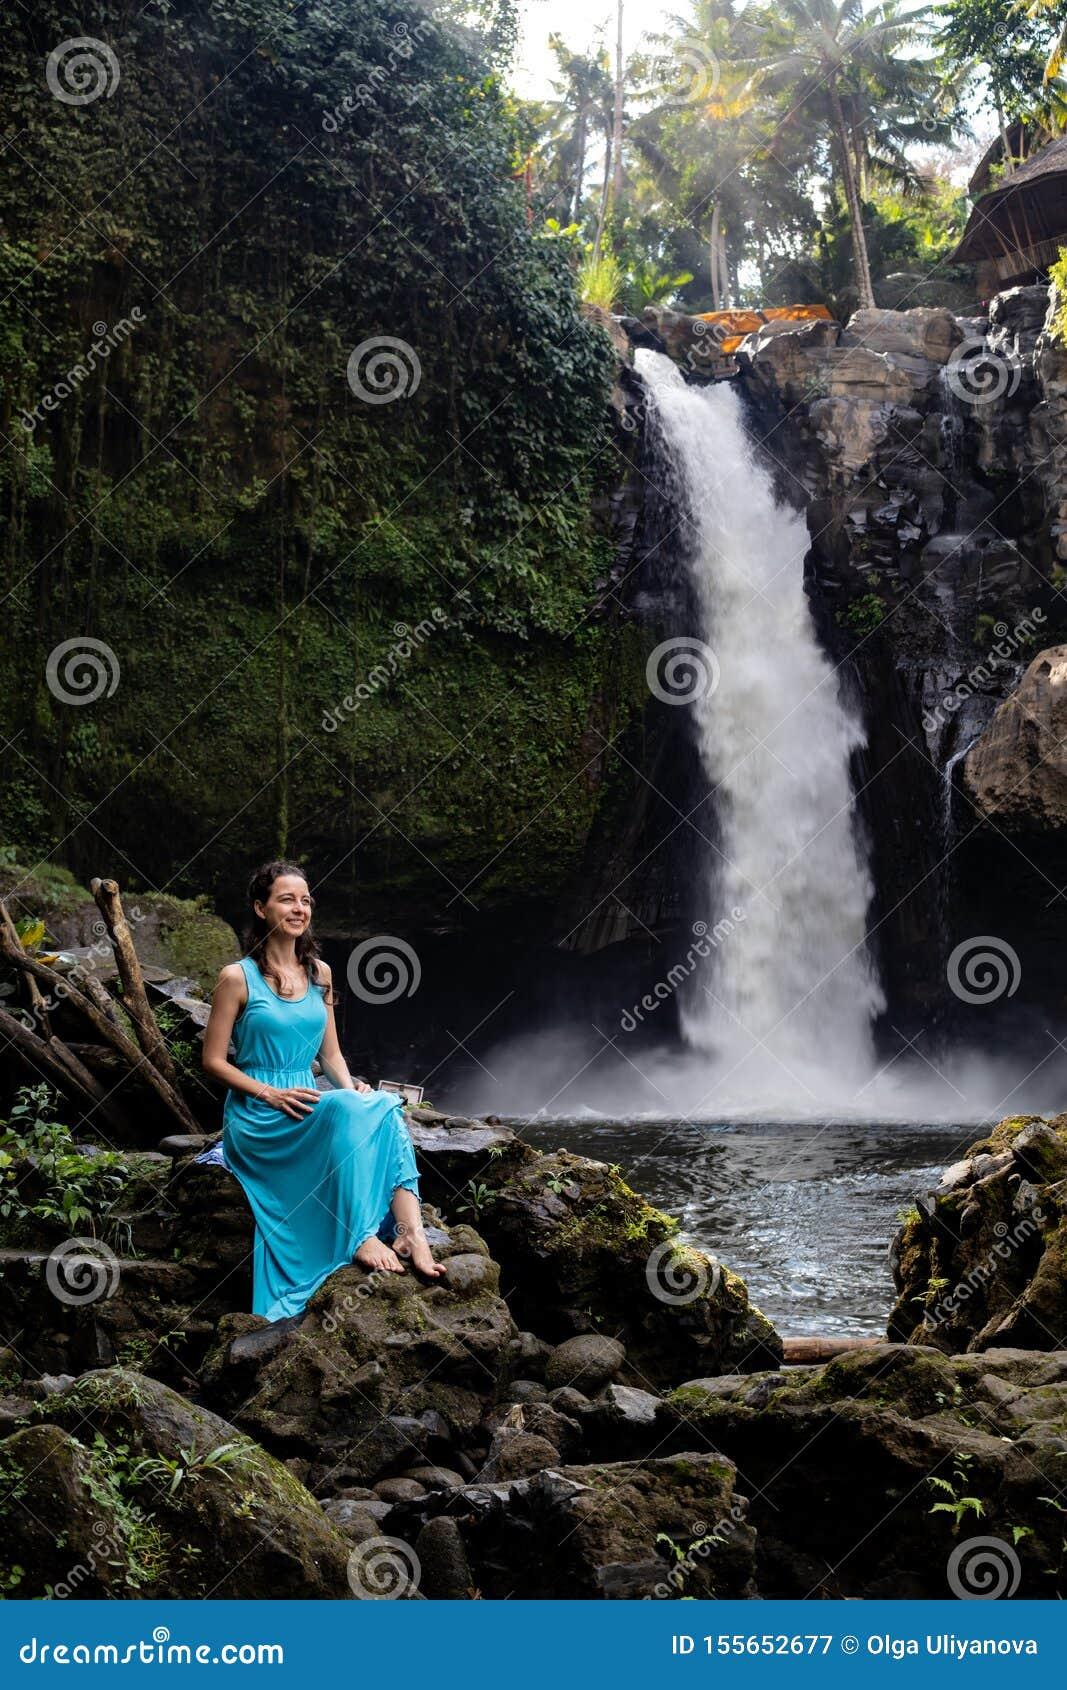 Alone Girl Sitting Beside Waterfall - Instamoz Photo sharing